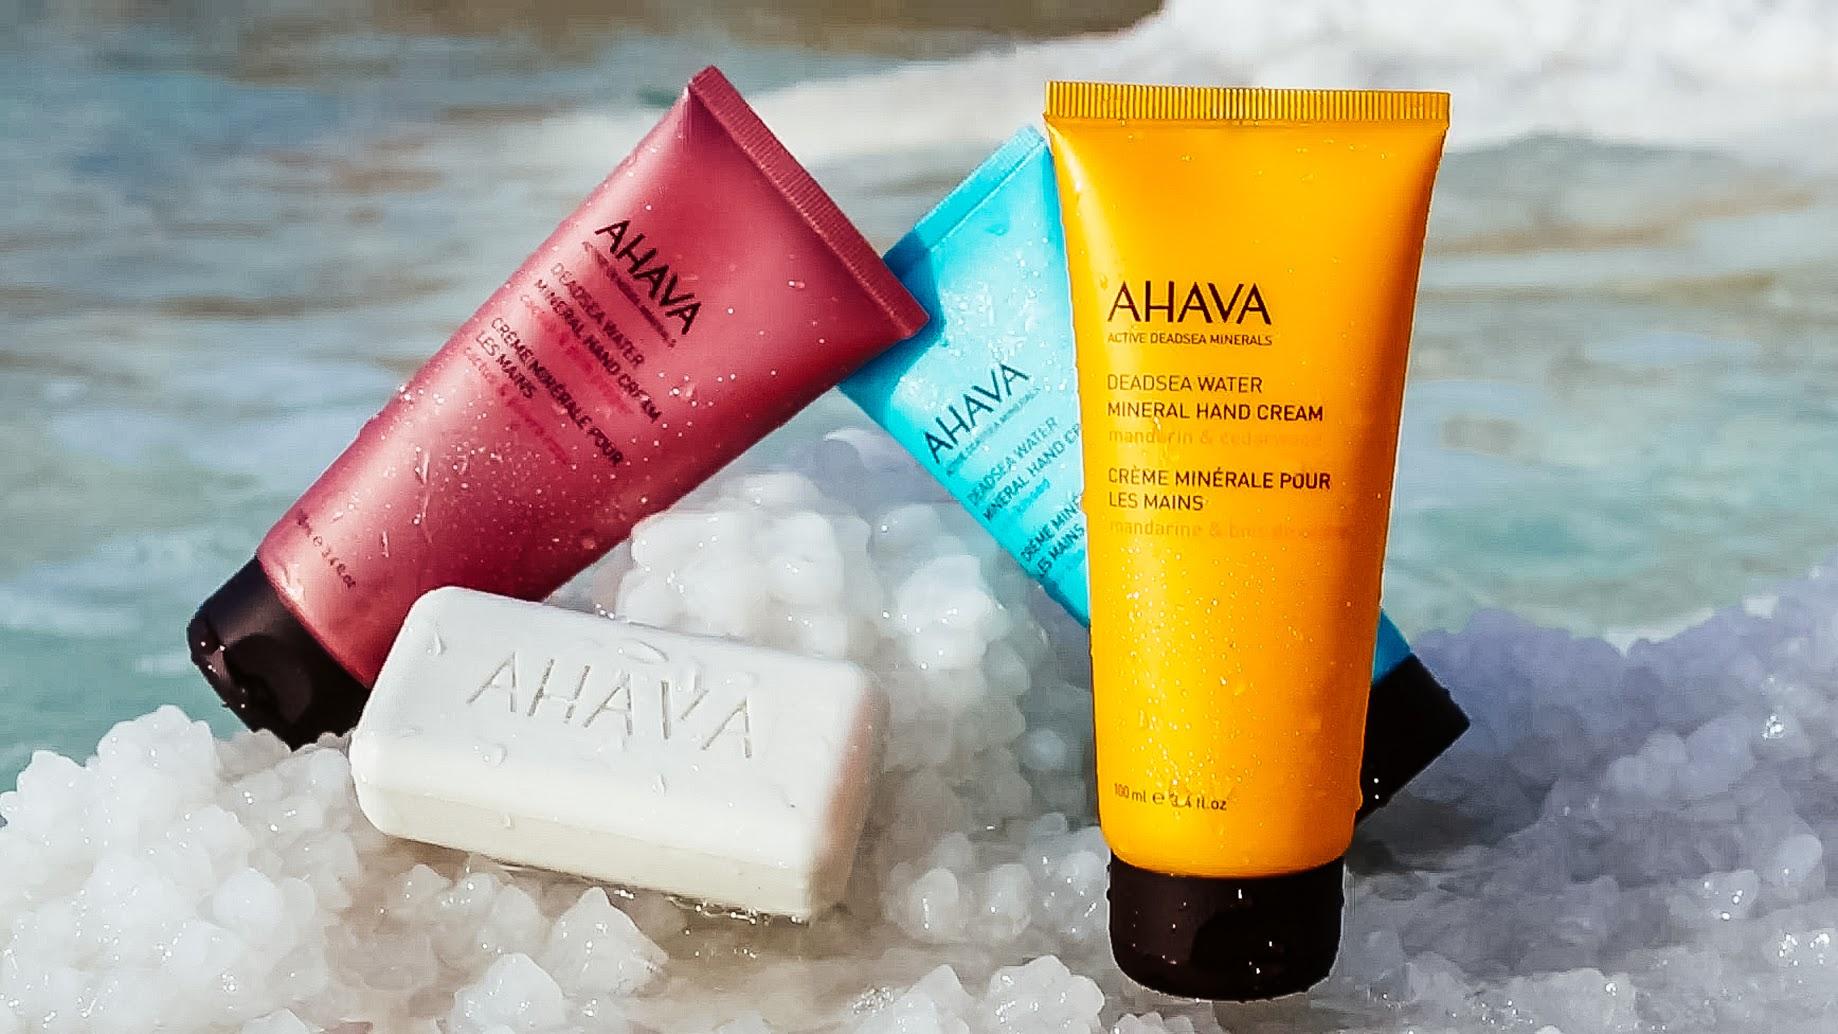 Dead Sea Ahava Hand Cream Minerals